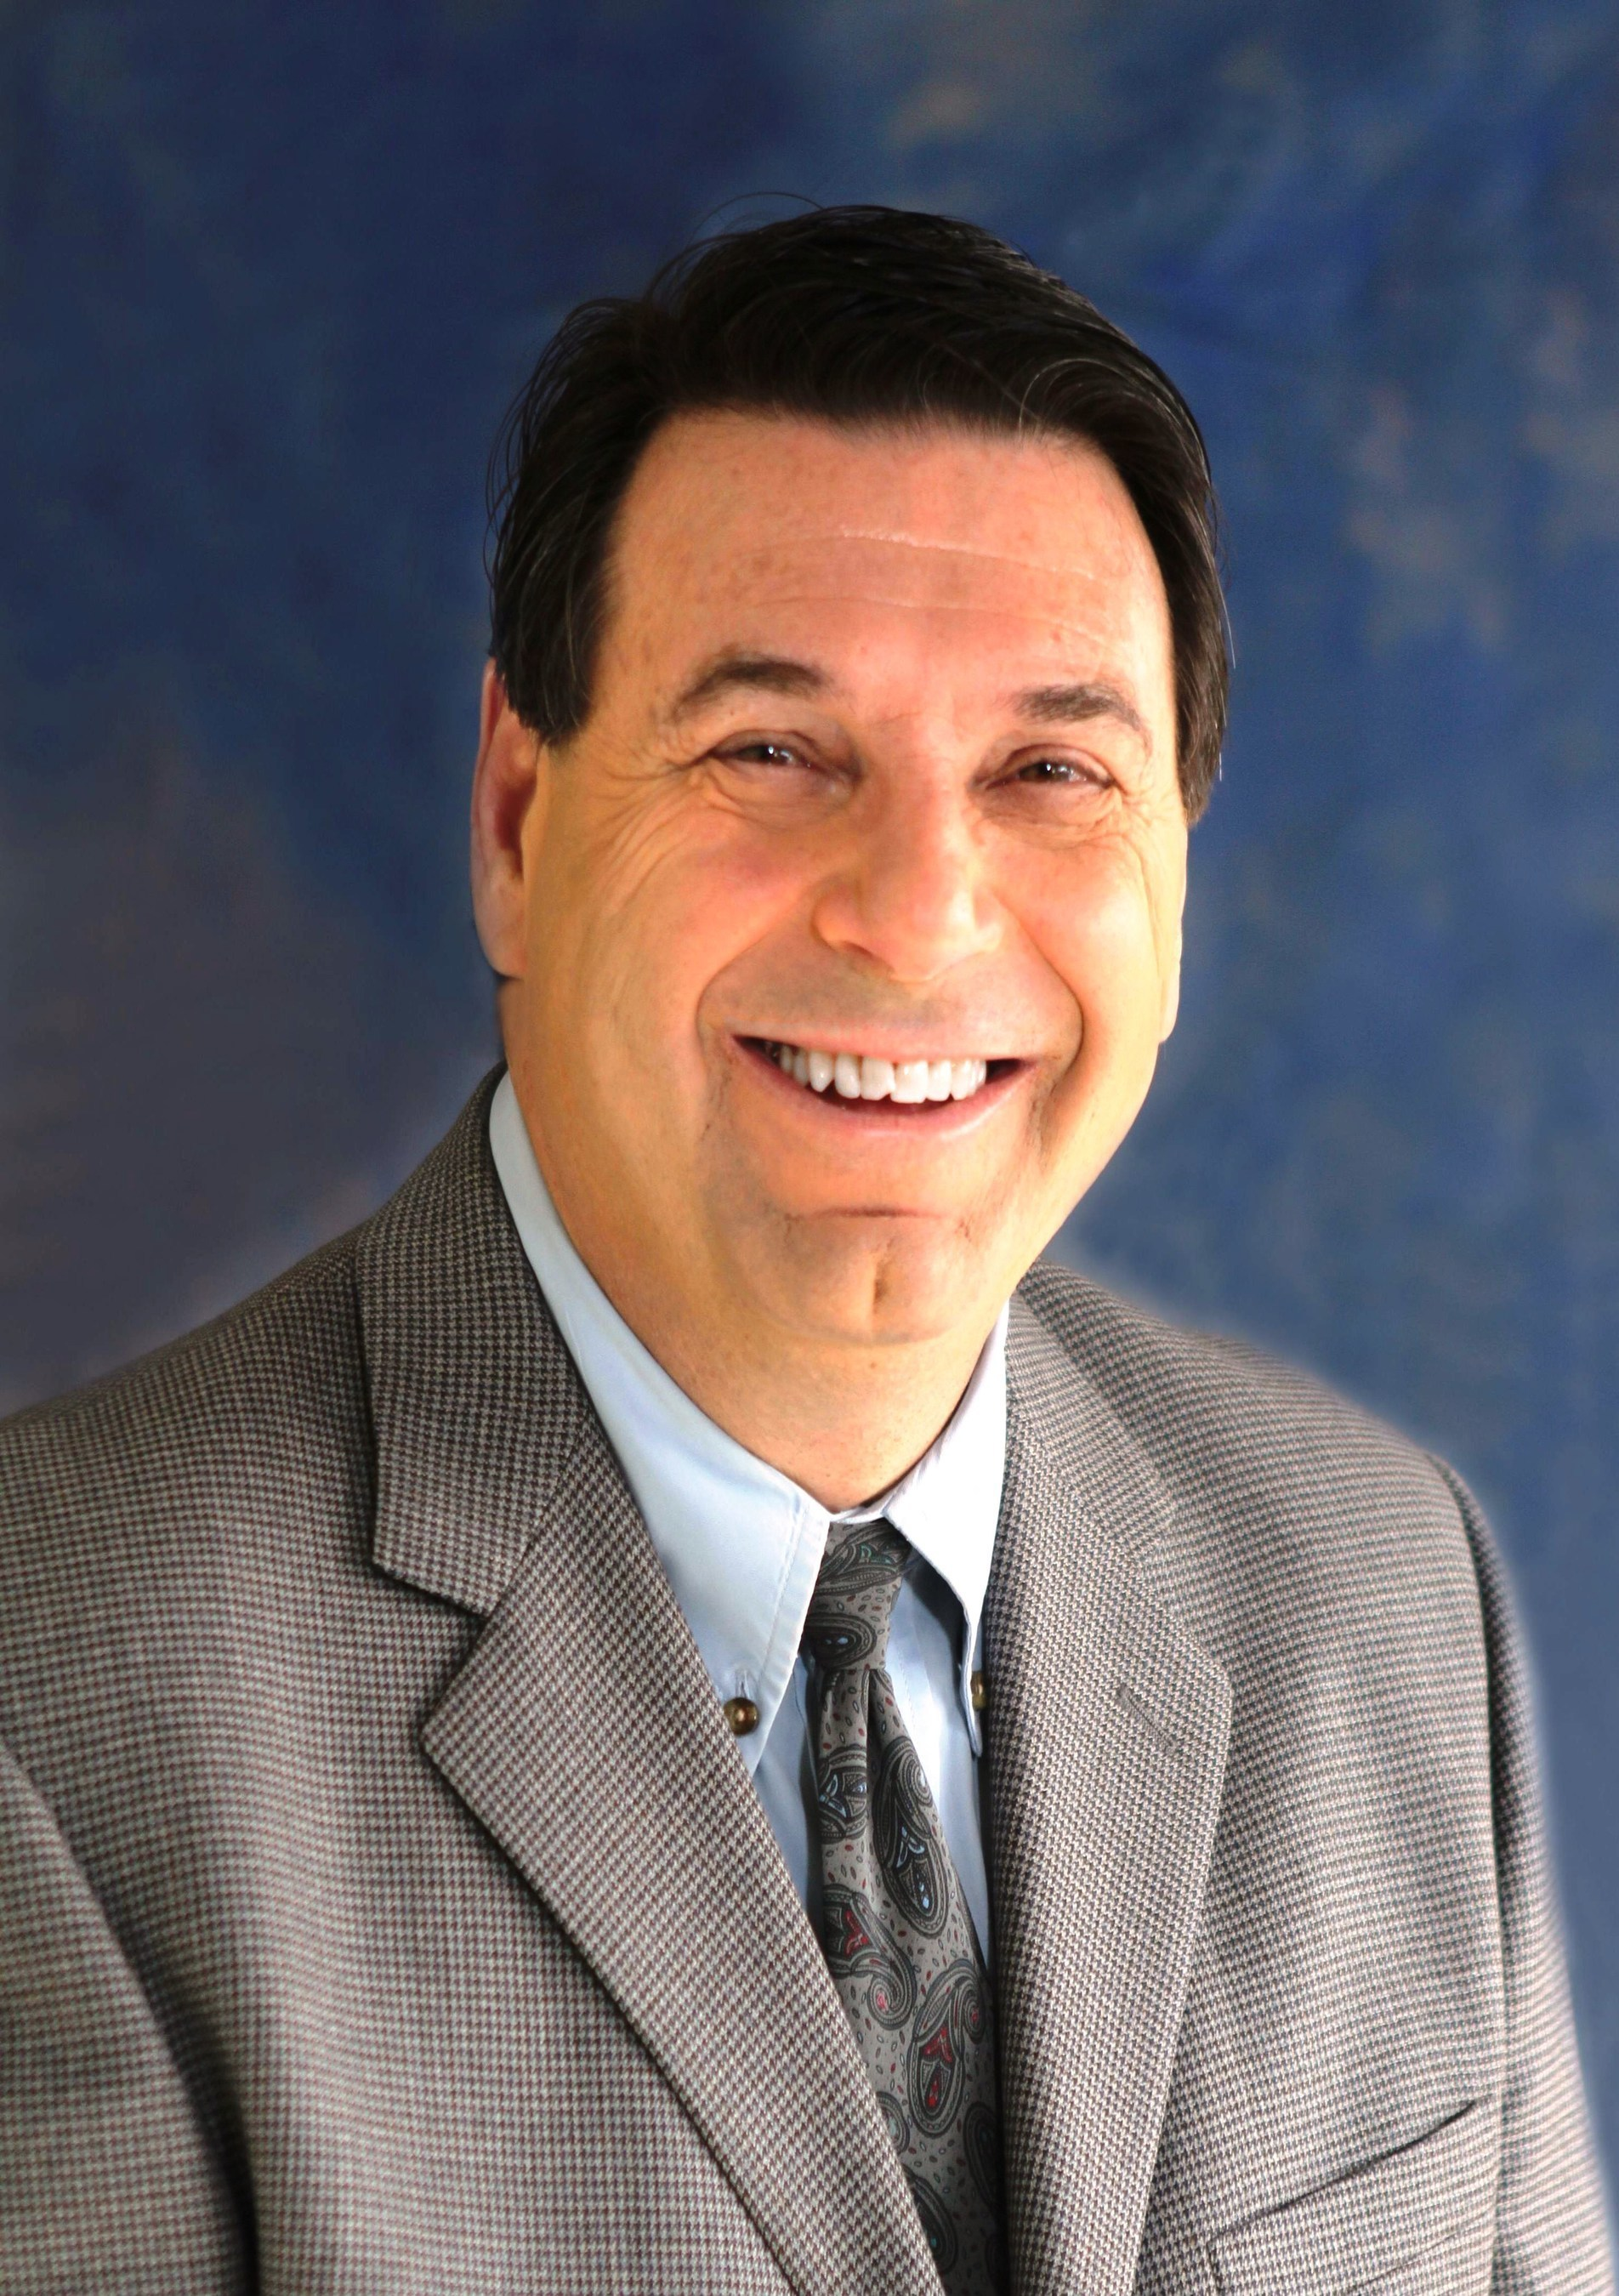 Dr. Dan Geller